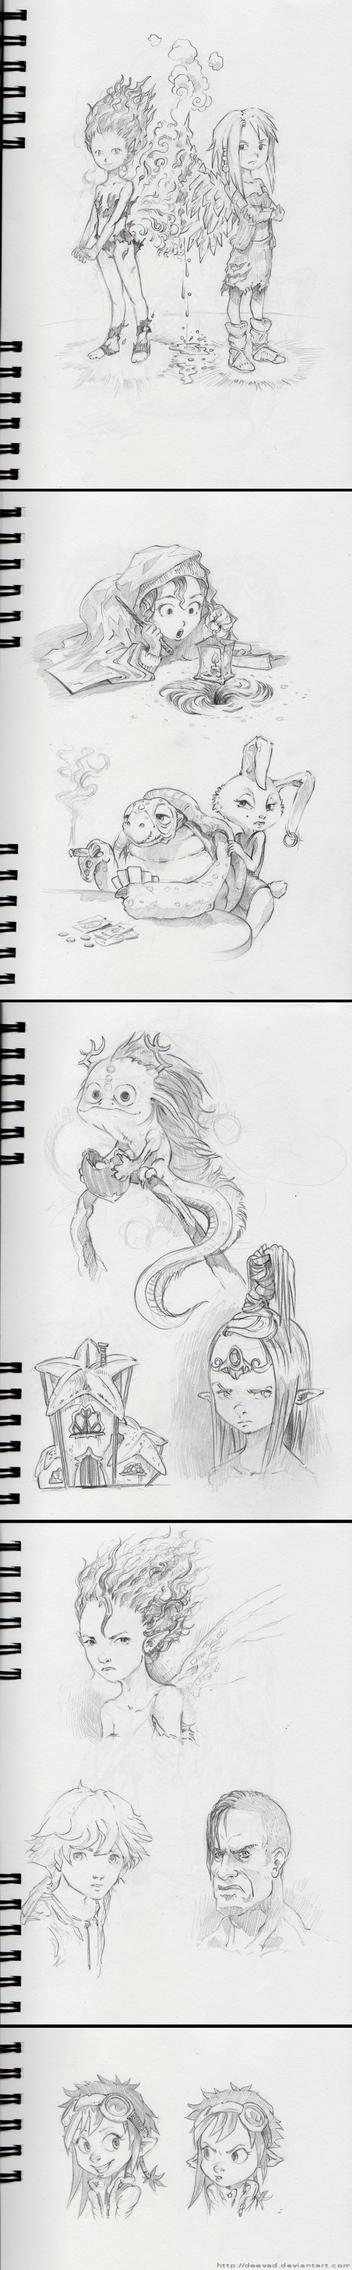 October 2012 Sketchbook Dump by Deevad